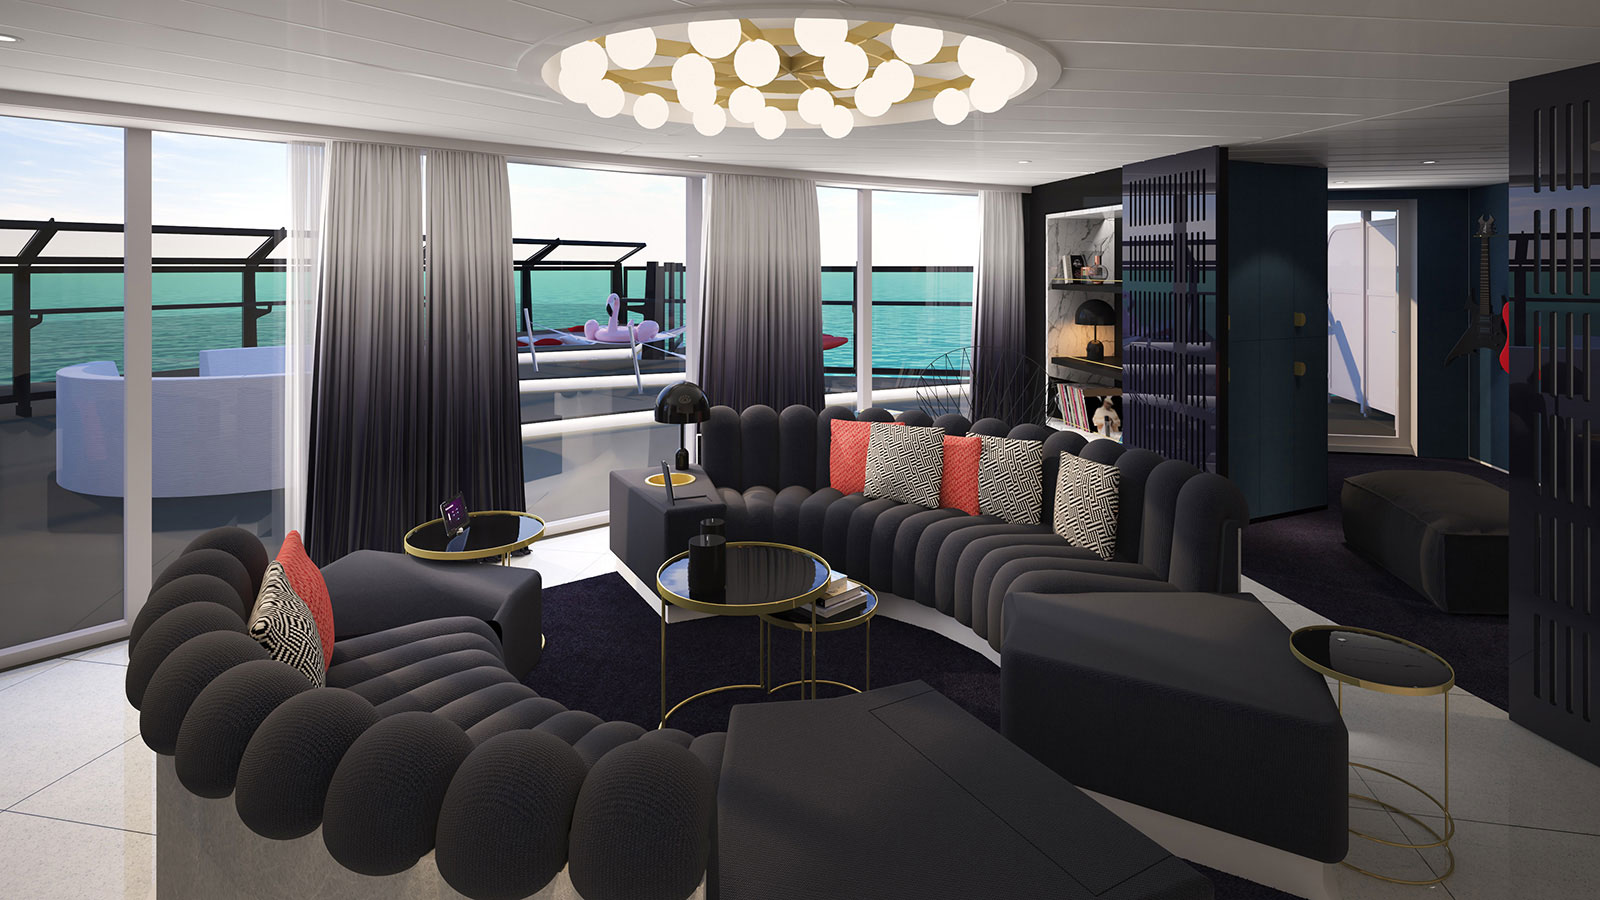 The RockStar Suite